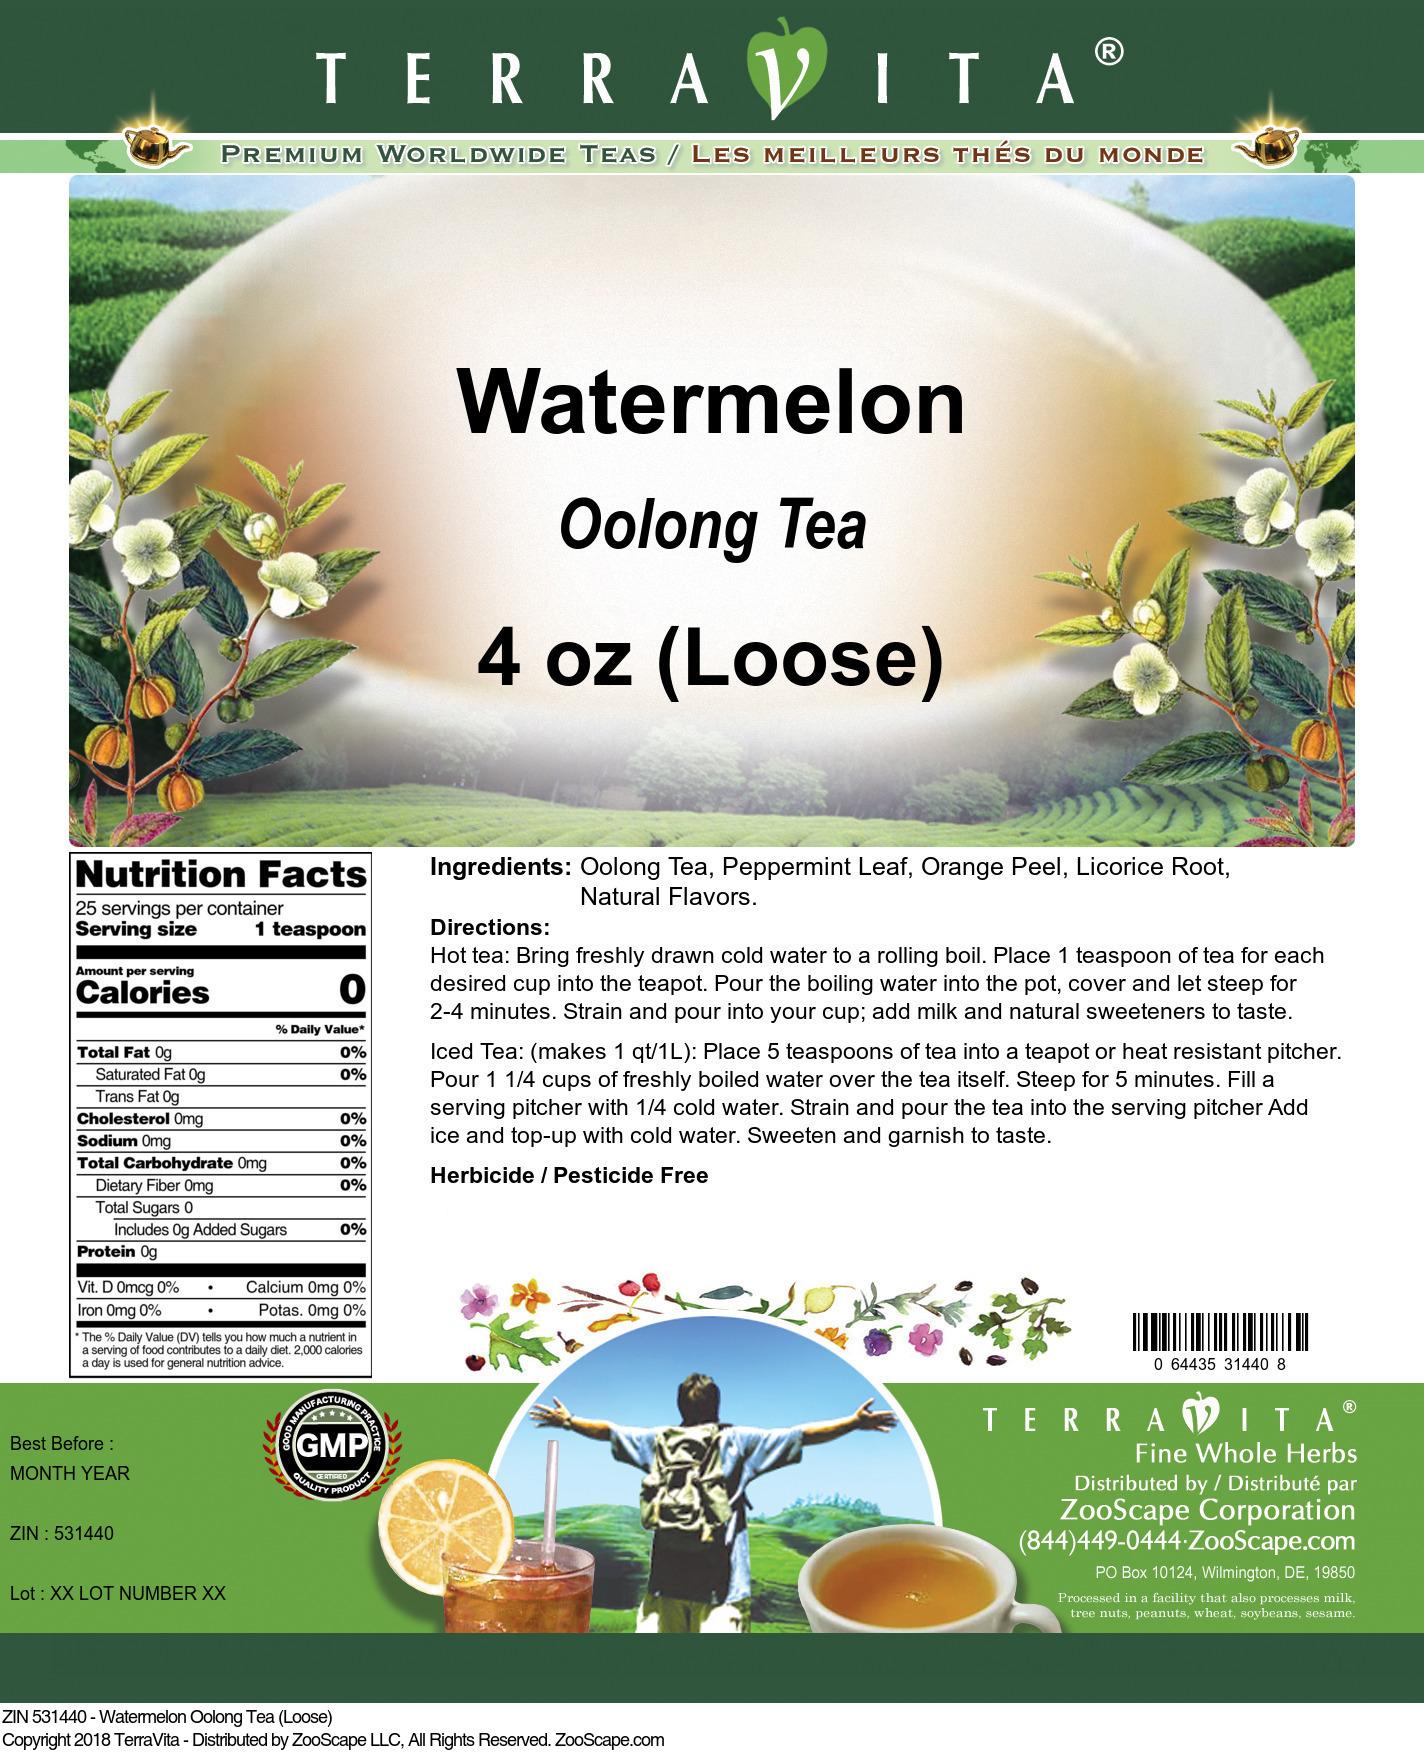 Watermelon Oolong Tea (Loose)